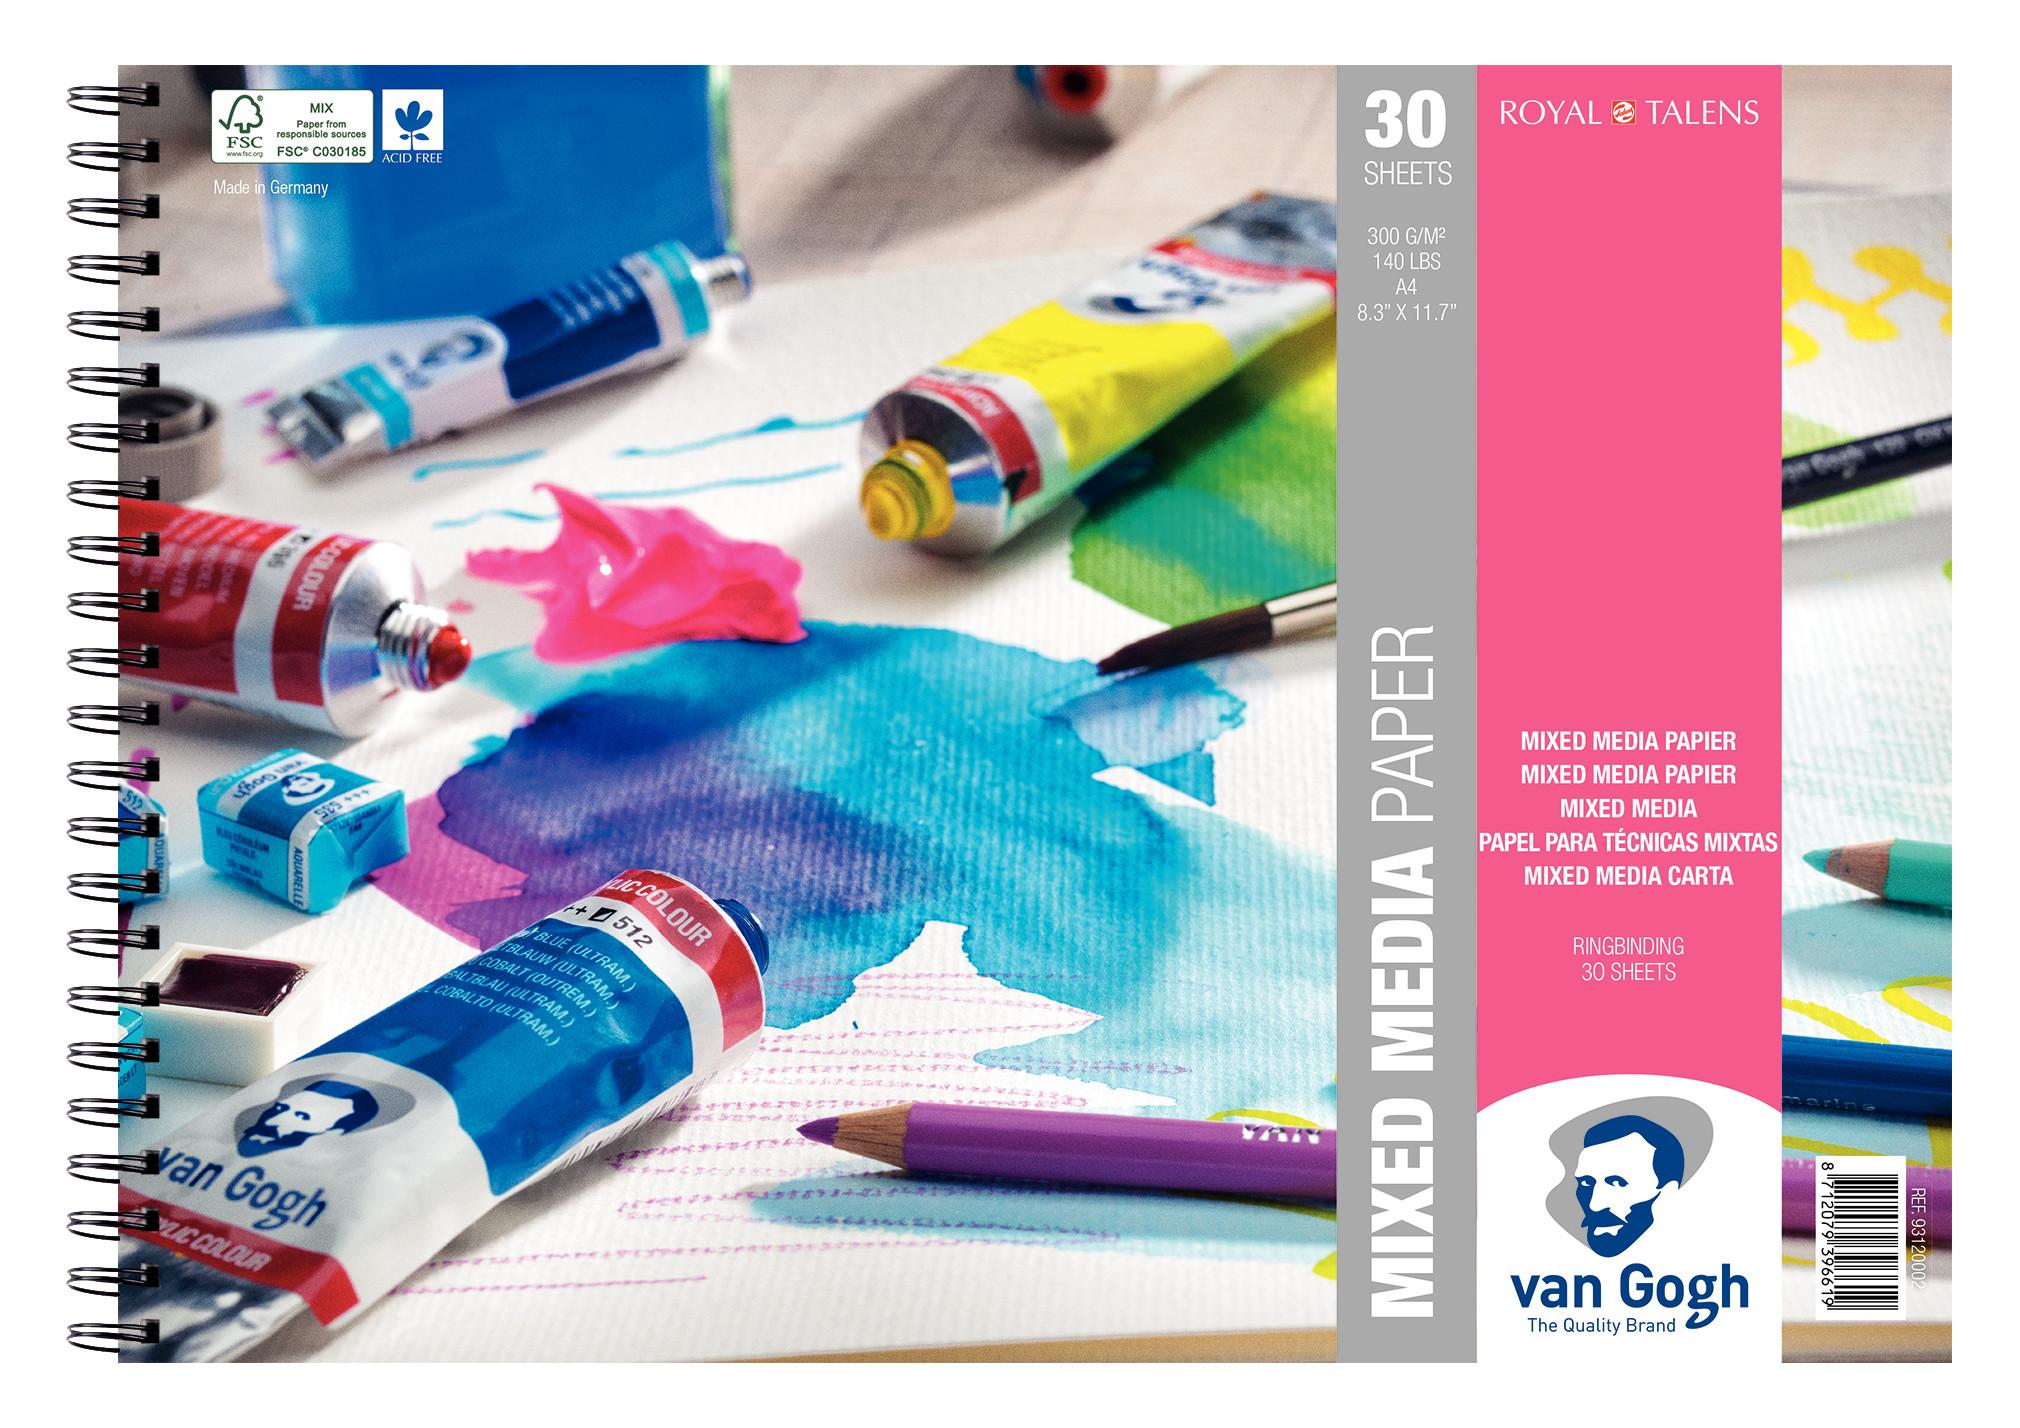 Van Gogh Mixed Media Paper Spiral Bound Pad, 30 Sheets, 300g/140lb., size 29.7 x 21cm (A4) / 8.3 x 11.7